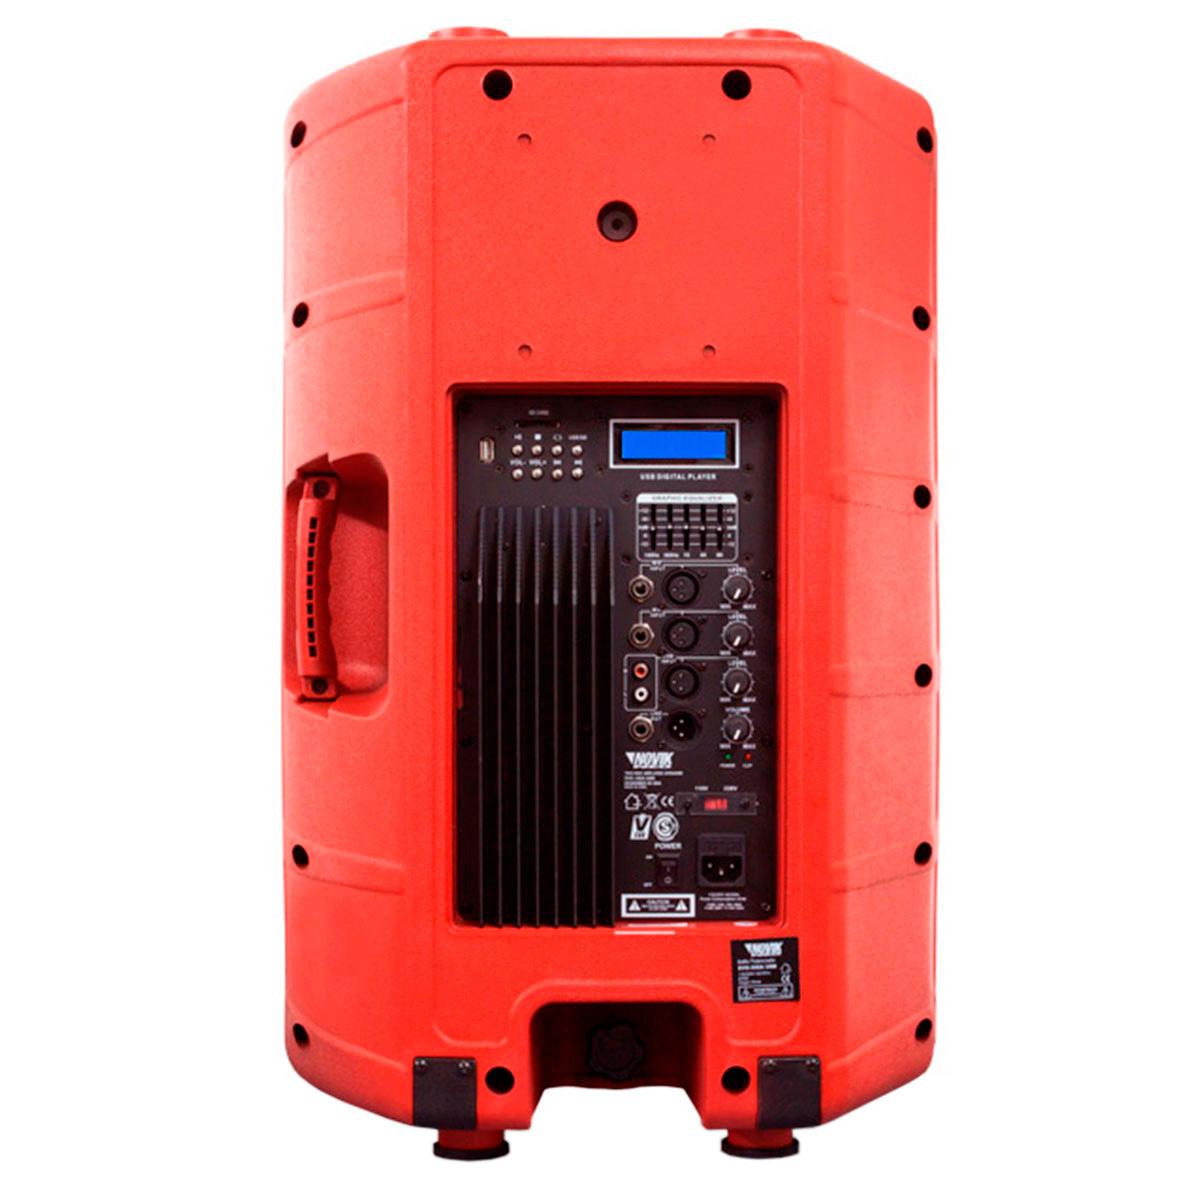 EVO350AUSB - Caixa Ativa 350W c/ USB EVO 350 A USB Vermelha - Novik Neo